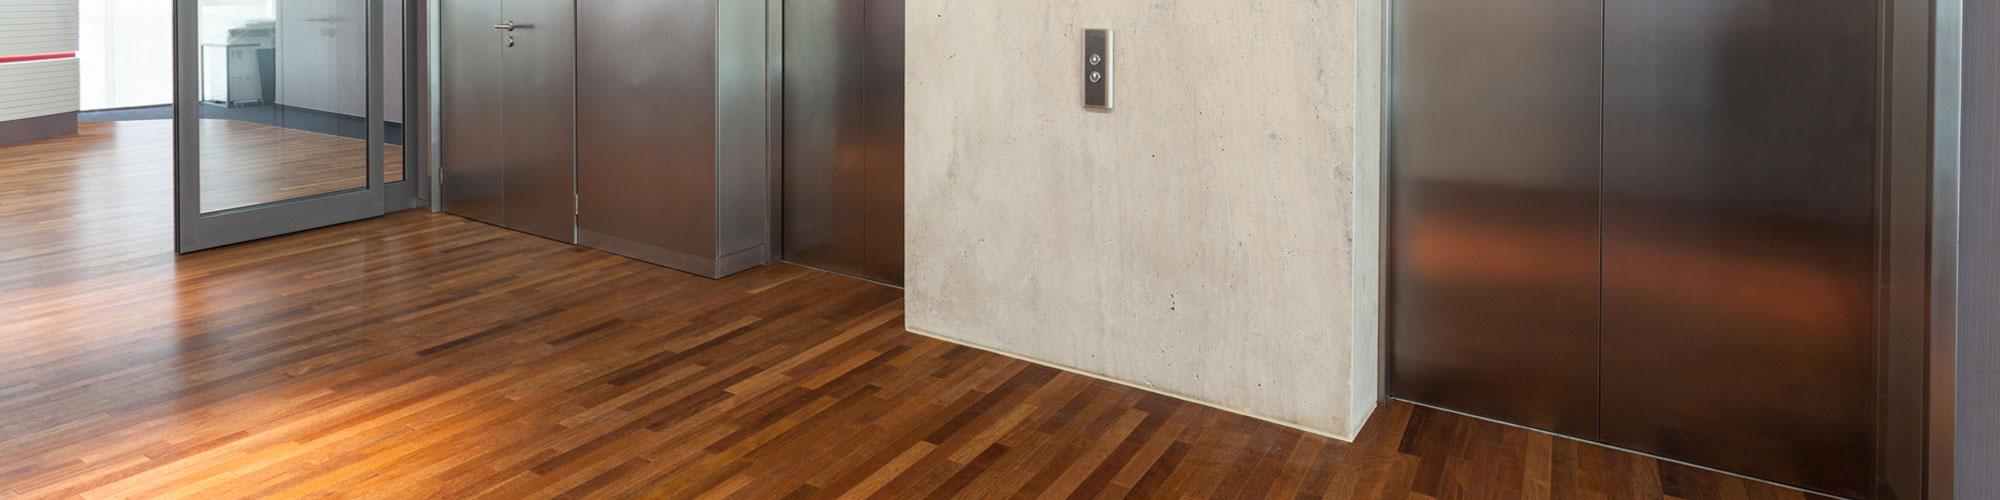 Commercial Hardwood Flooring st augustine commercial and residential hardwood floor installation and refinishing Commercial Hardwood Flooring Hardwood Floor Maintenance Boston Ma